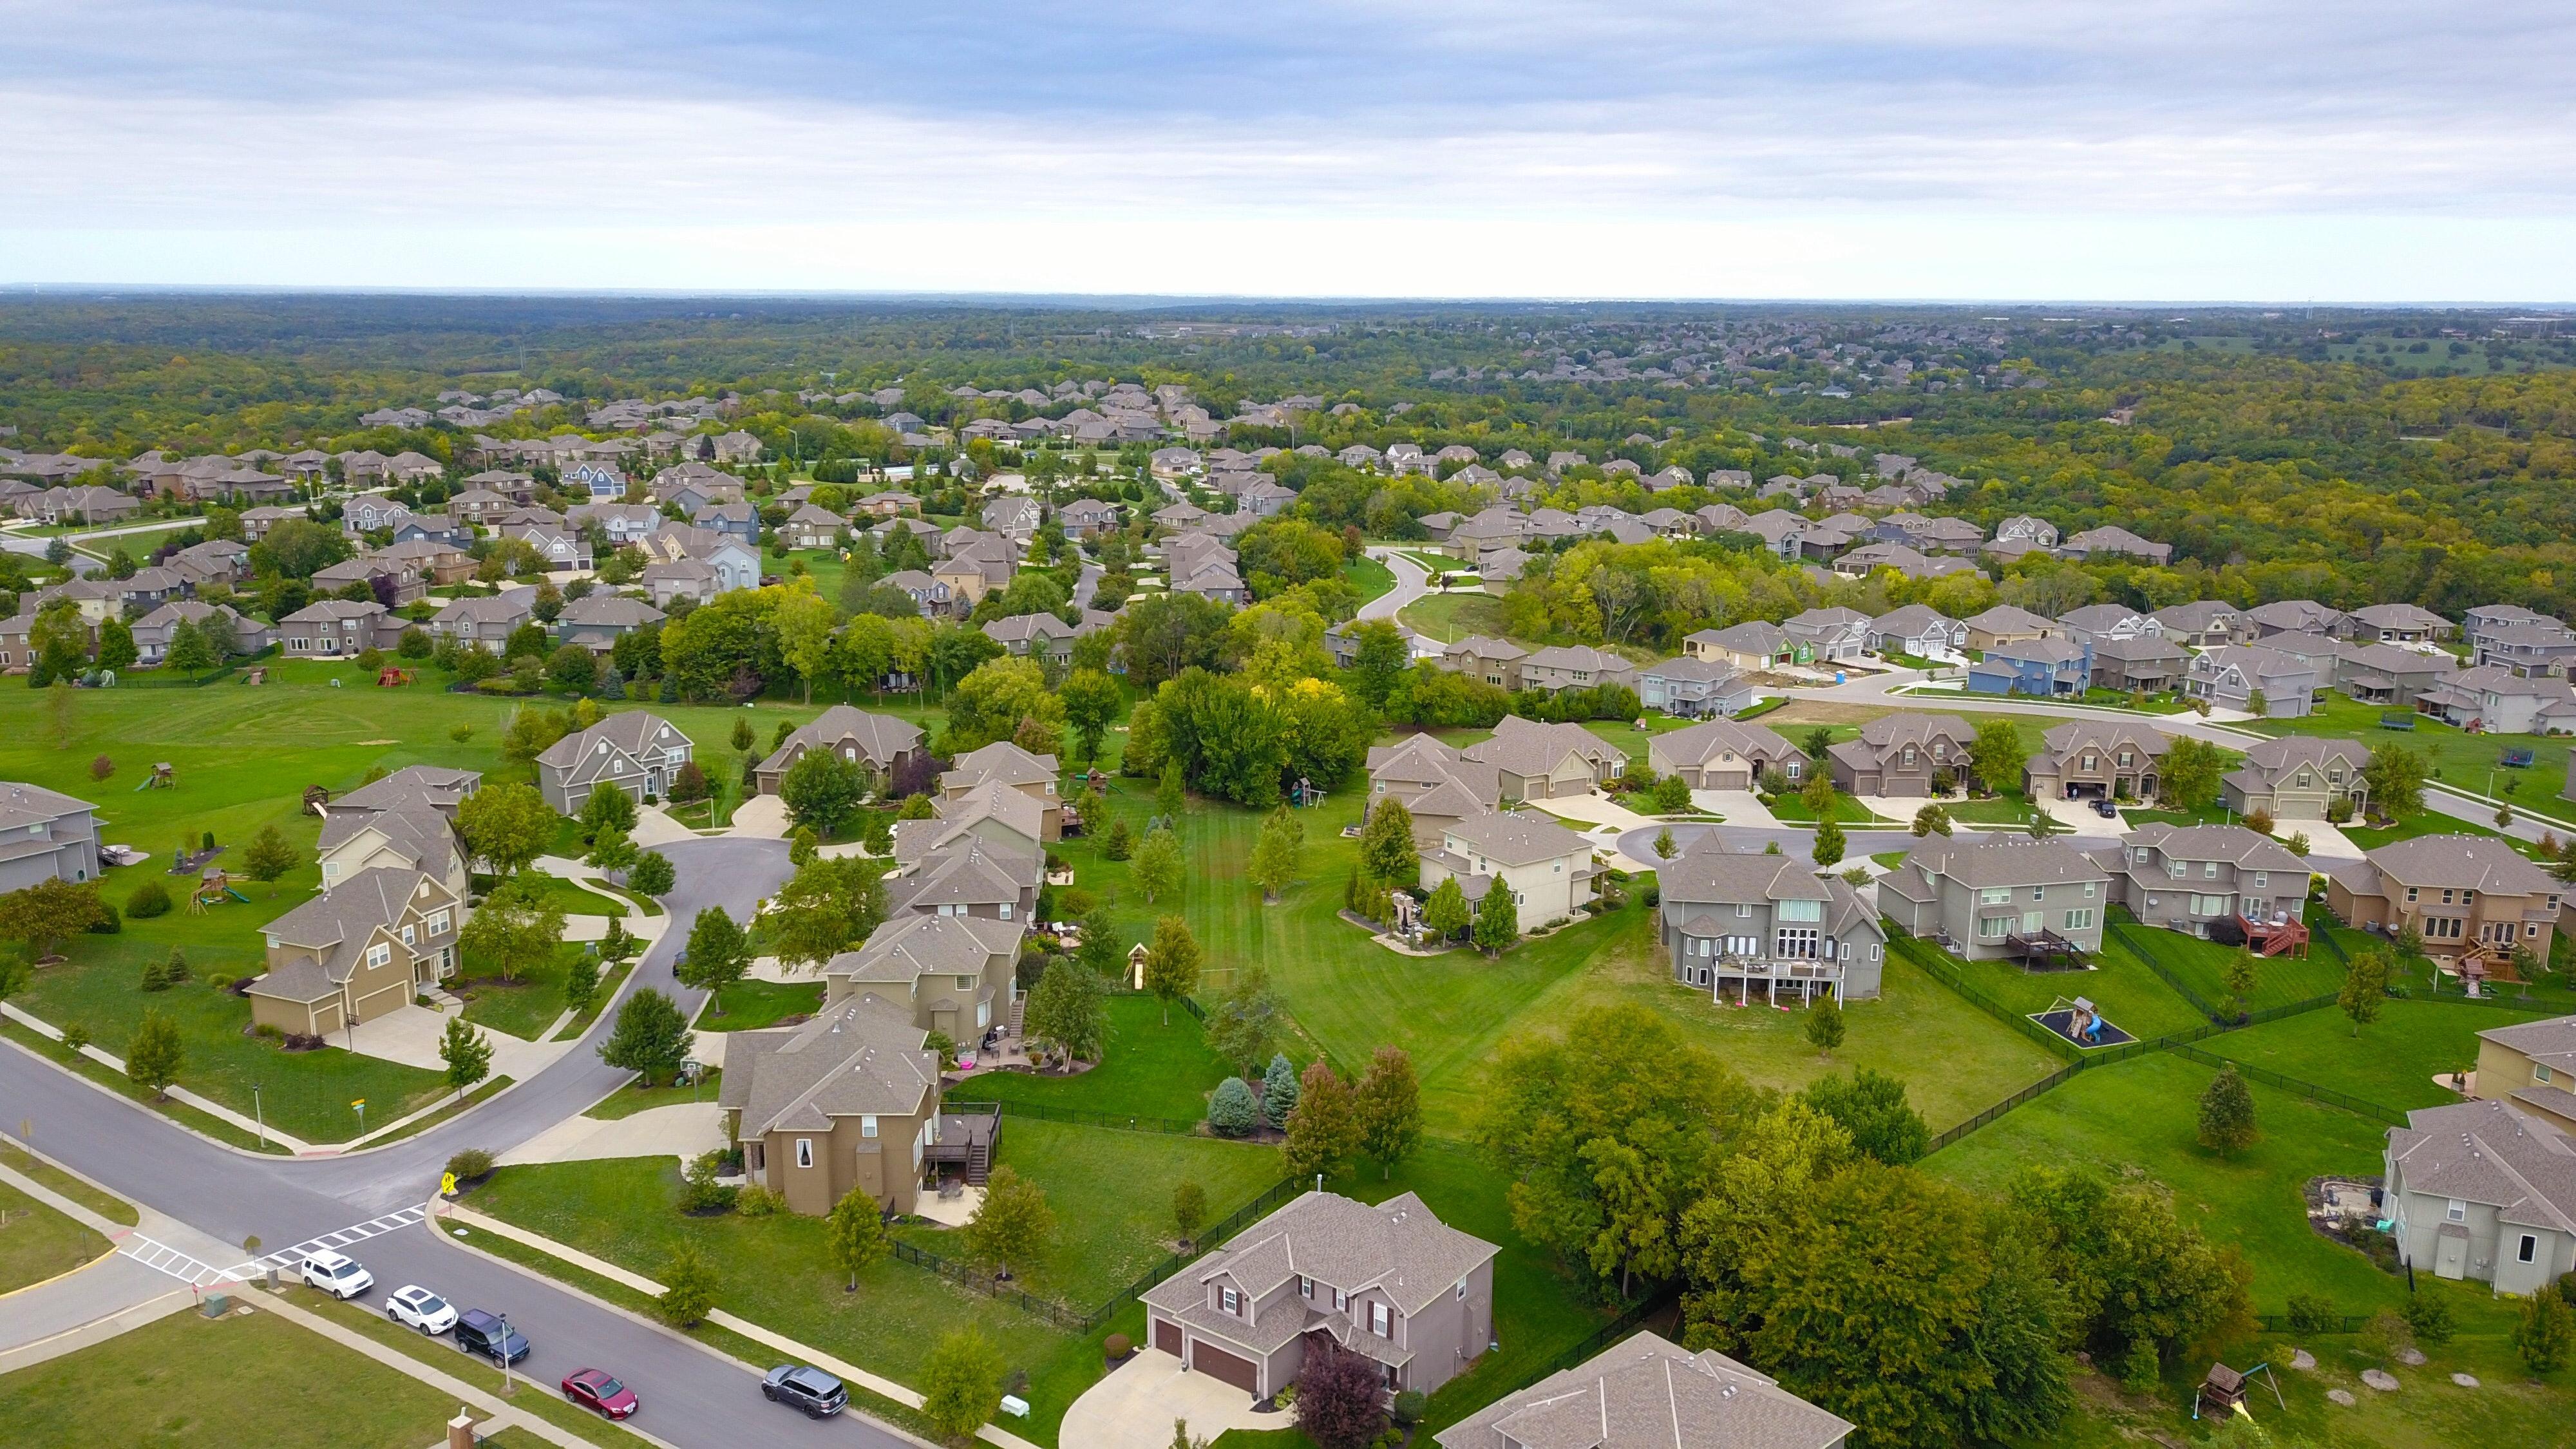 Homes in a neighborhood setting